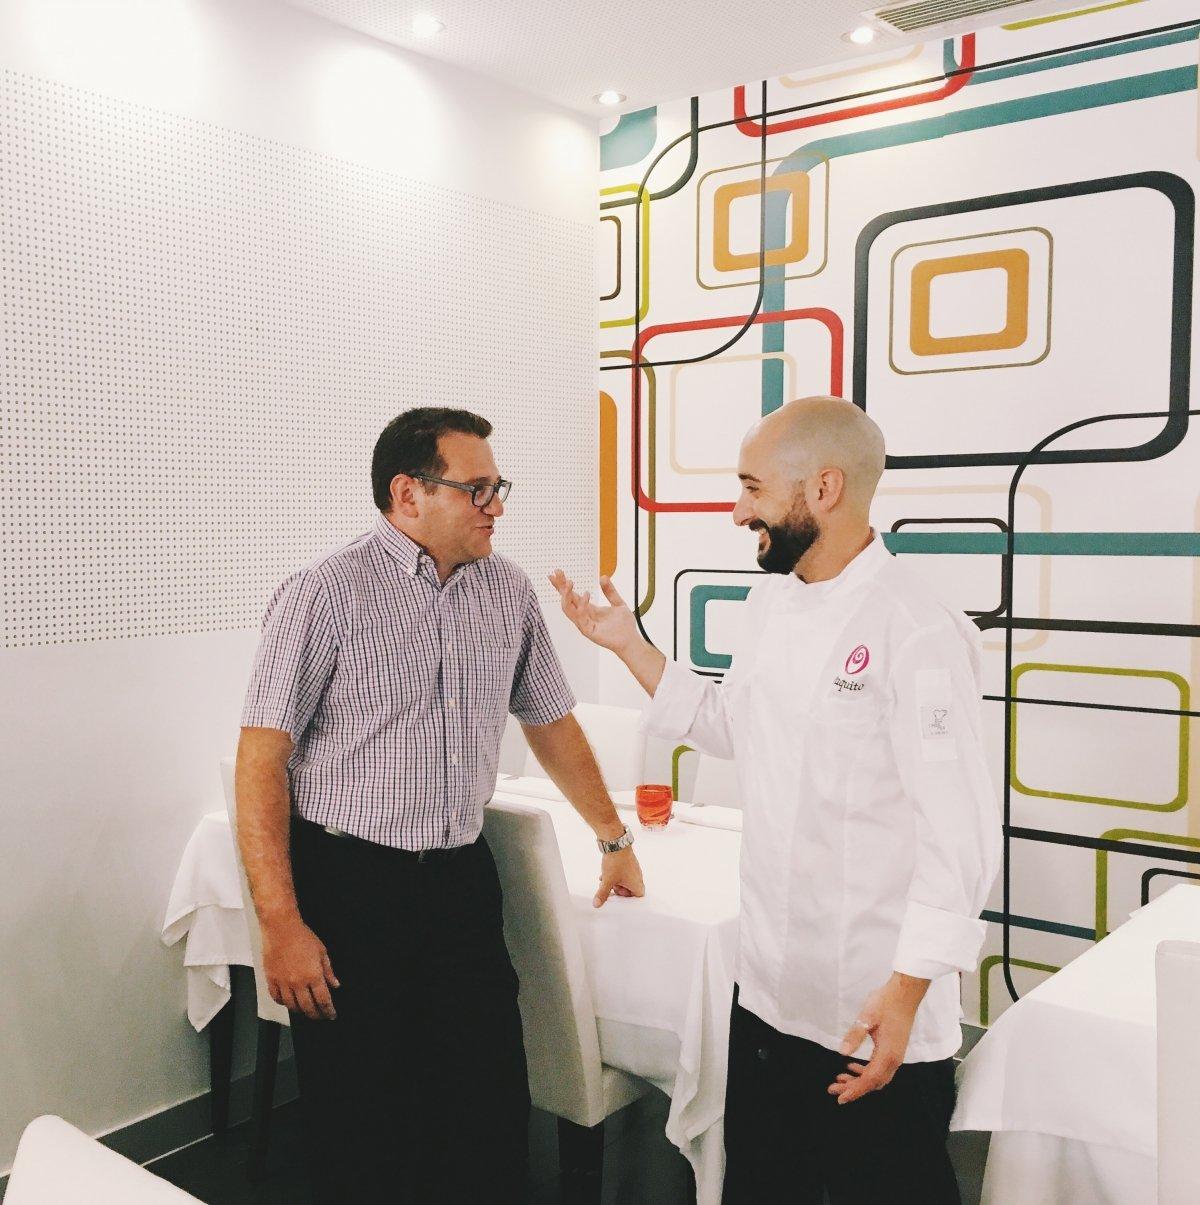 Paco y Jaume, responsables del restaurante K-anròs